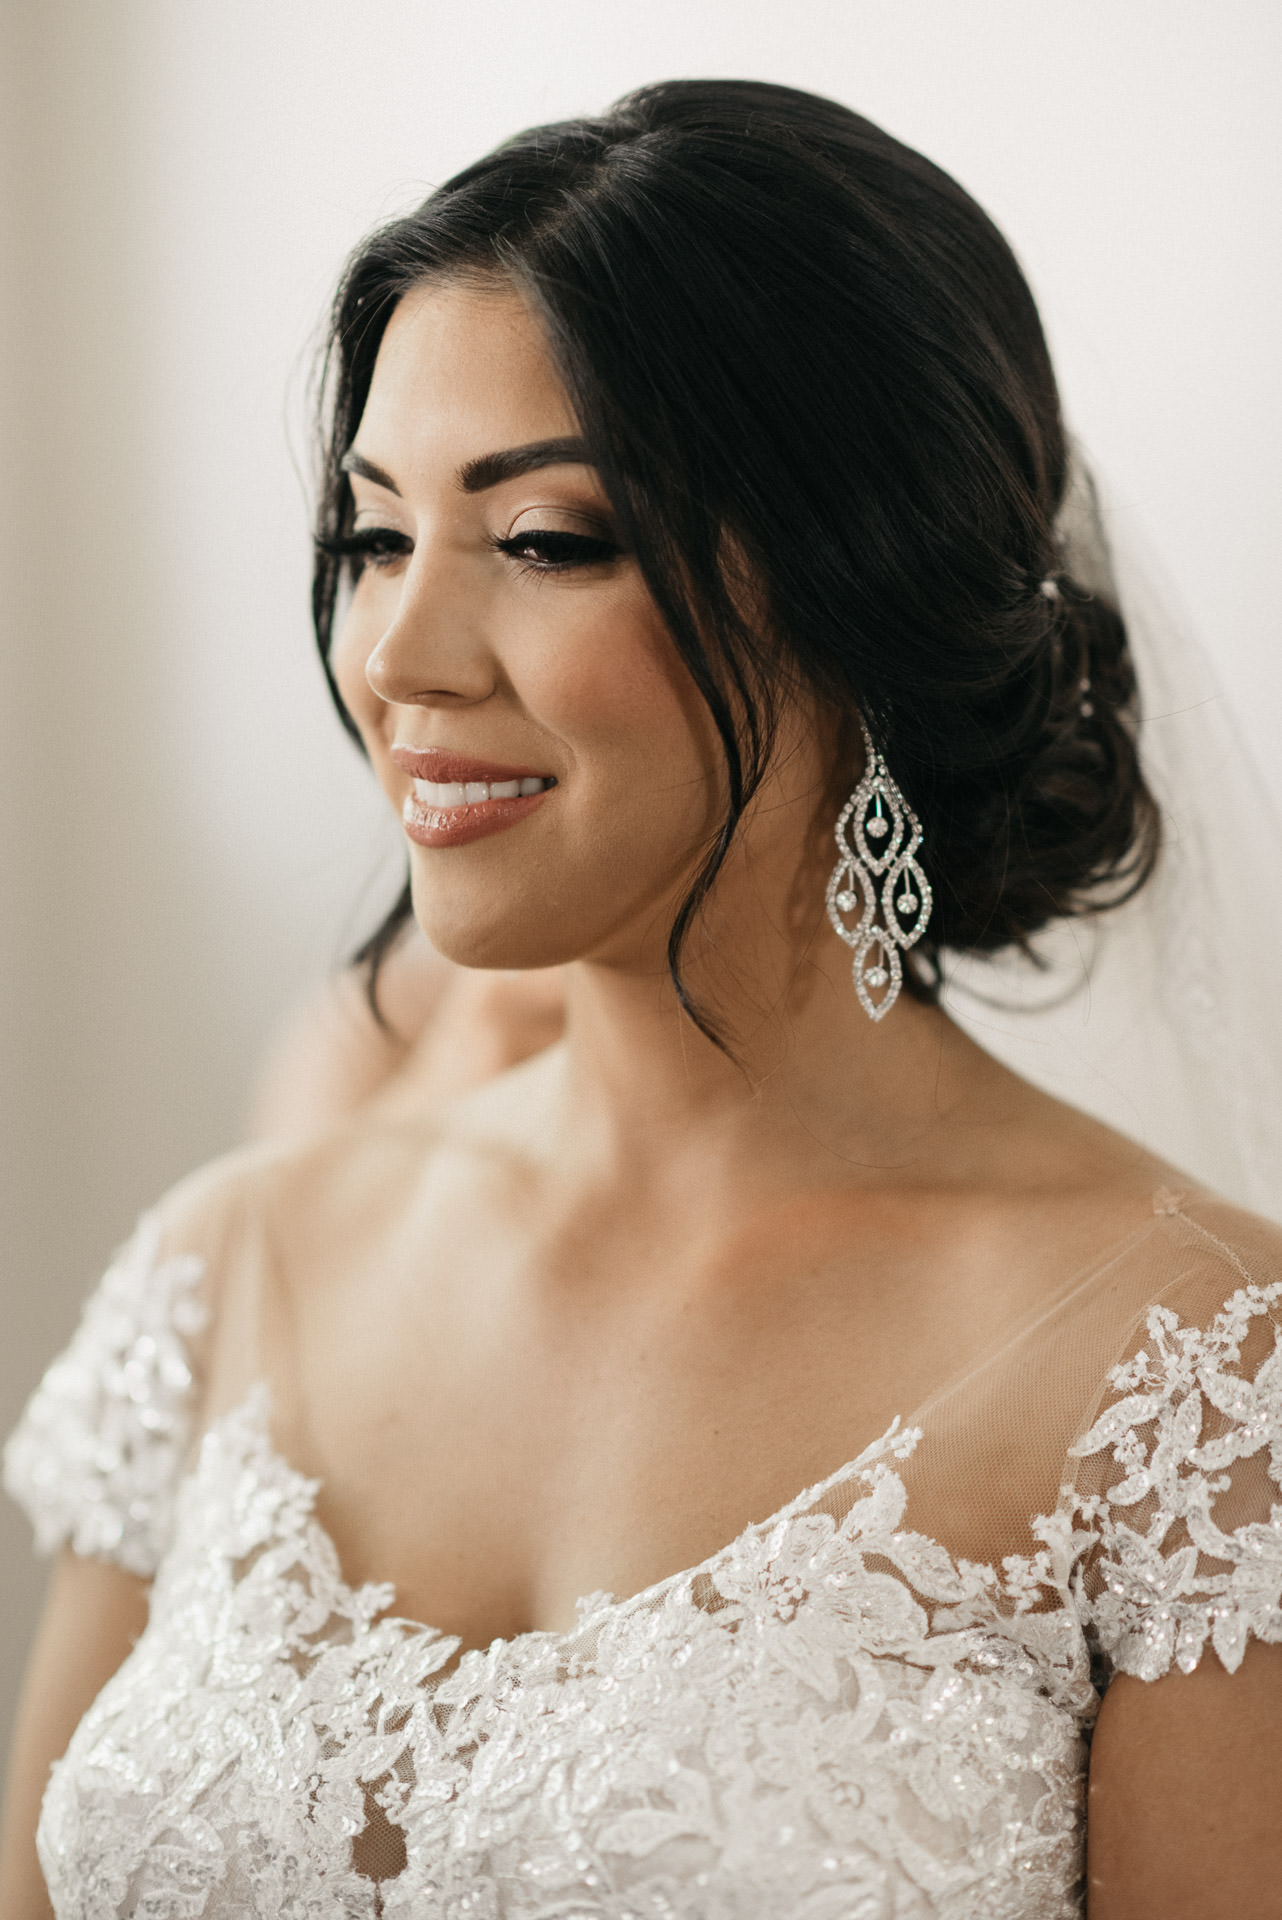 lexi-michael-wedding-blog-sm-33.jpg